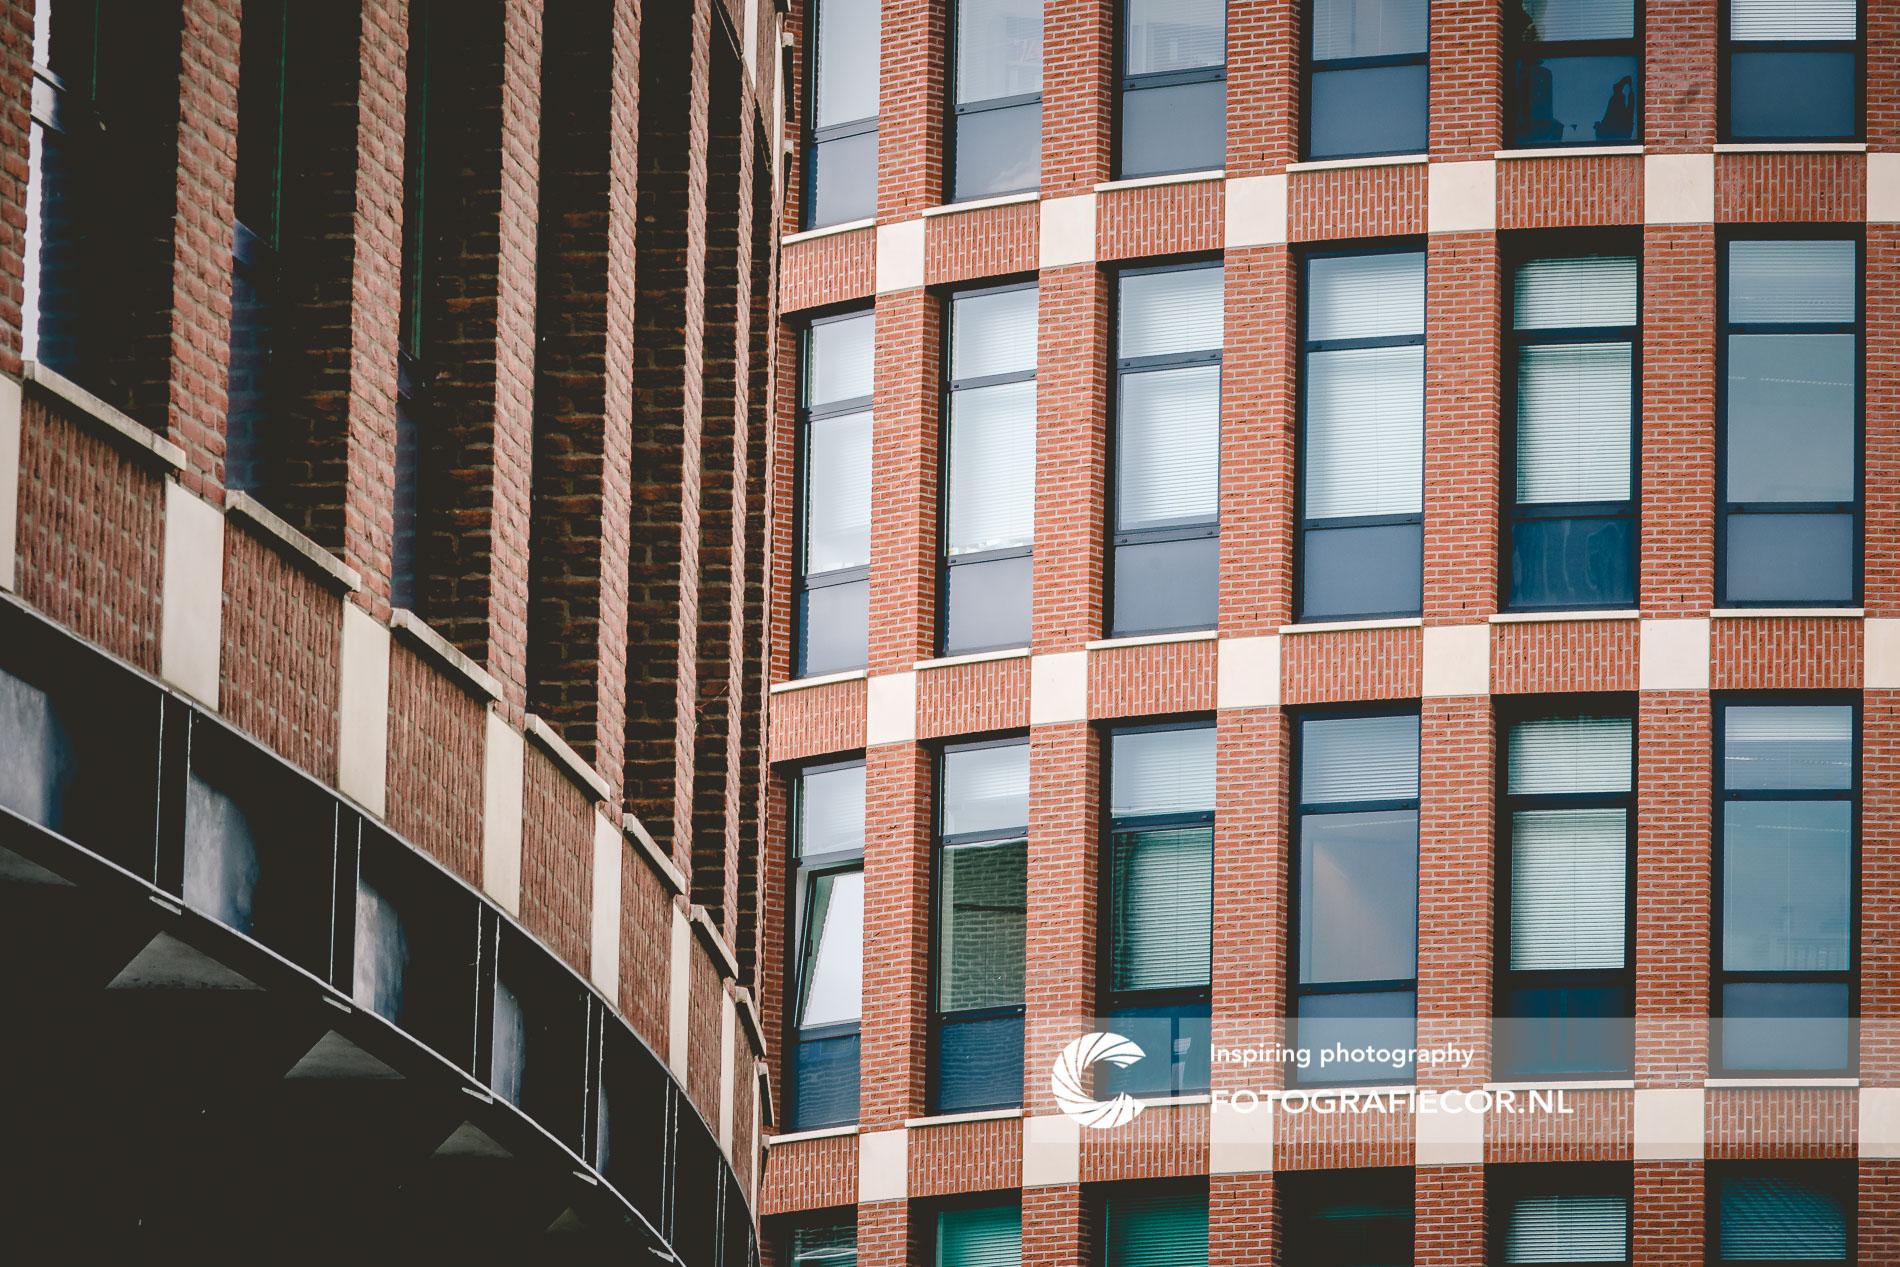 Lijnenspel gebouw Roermond | architectuurfotograaf